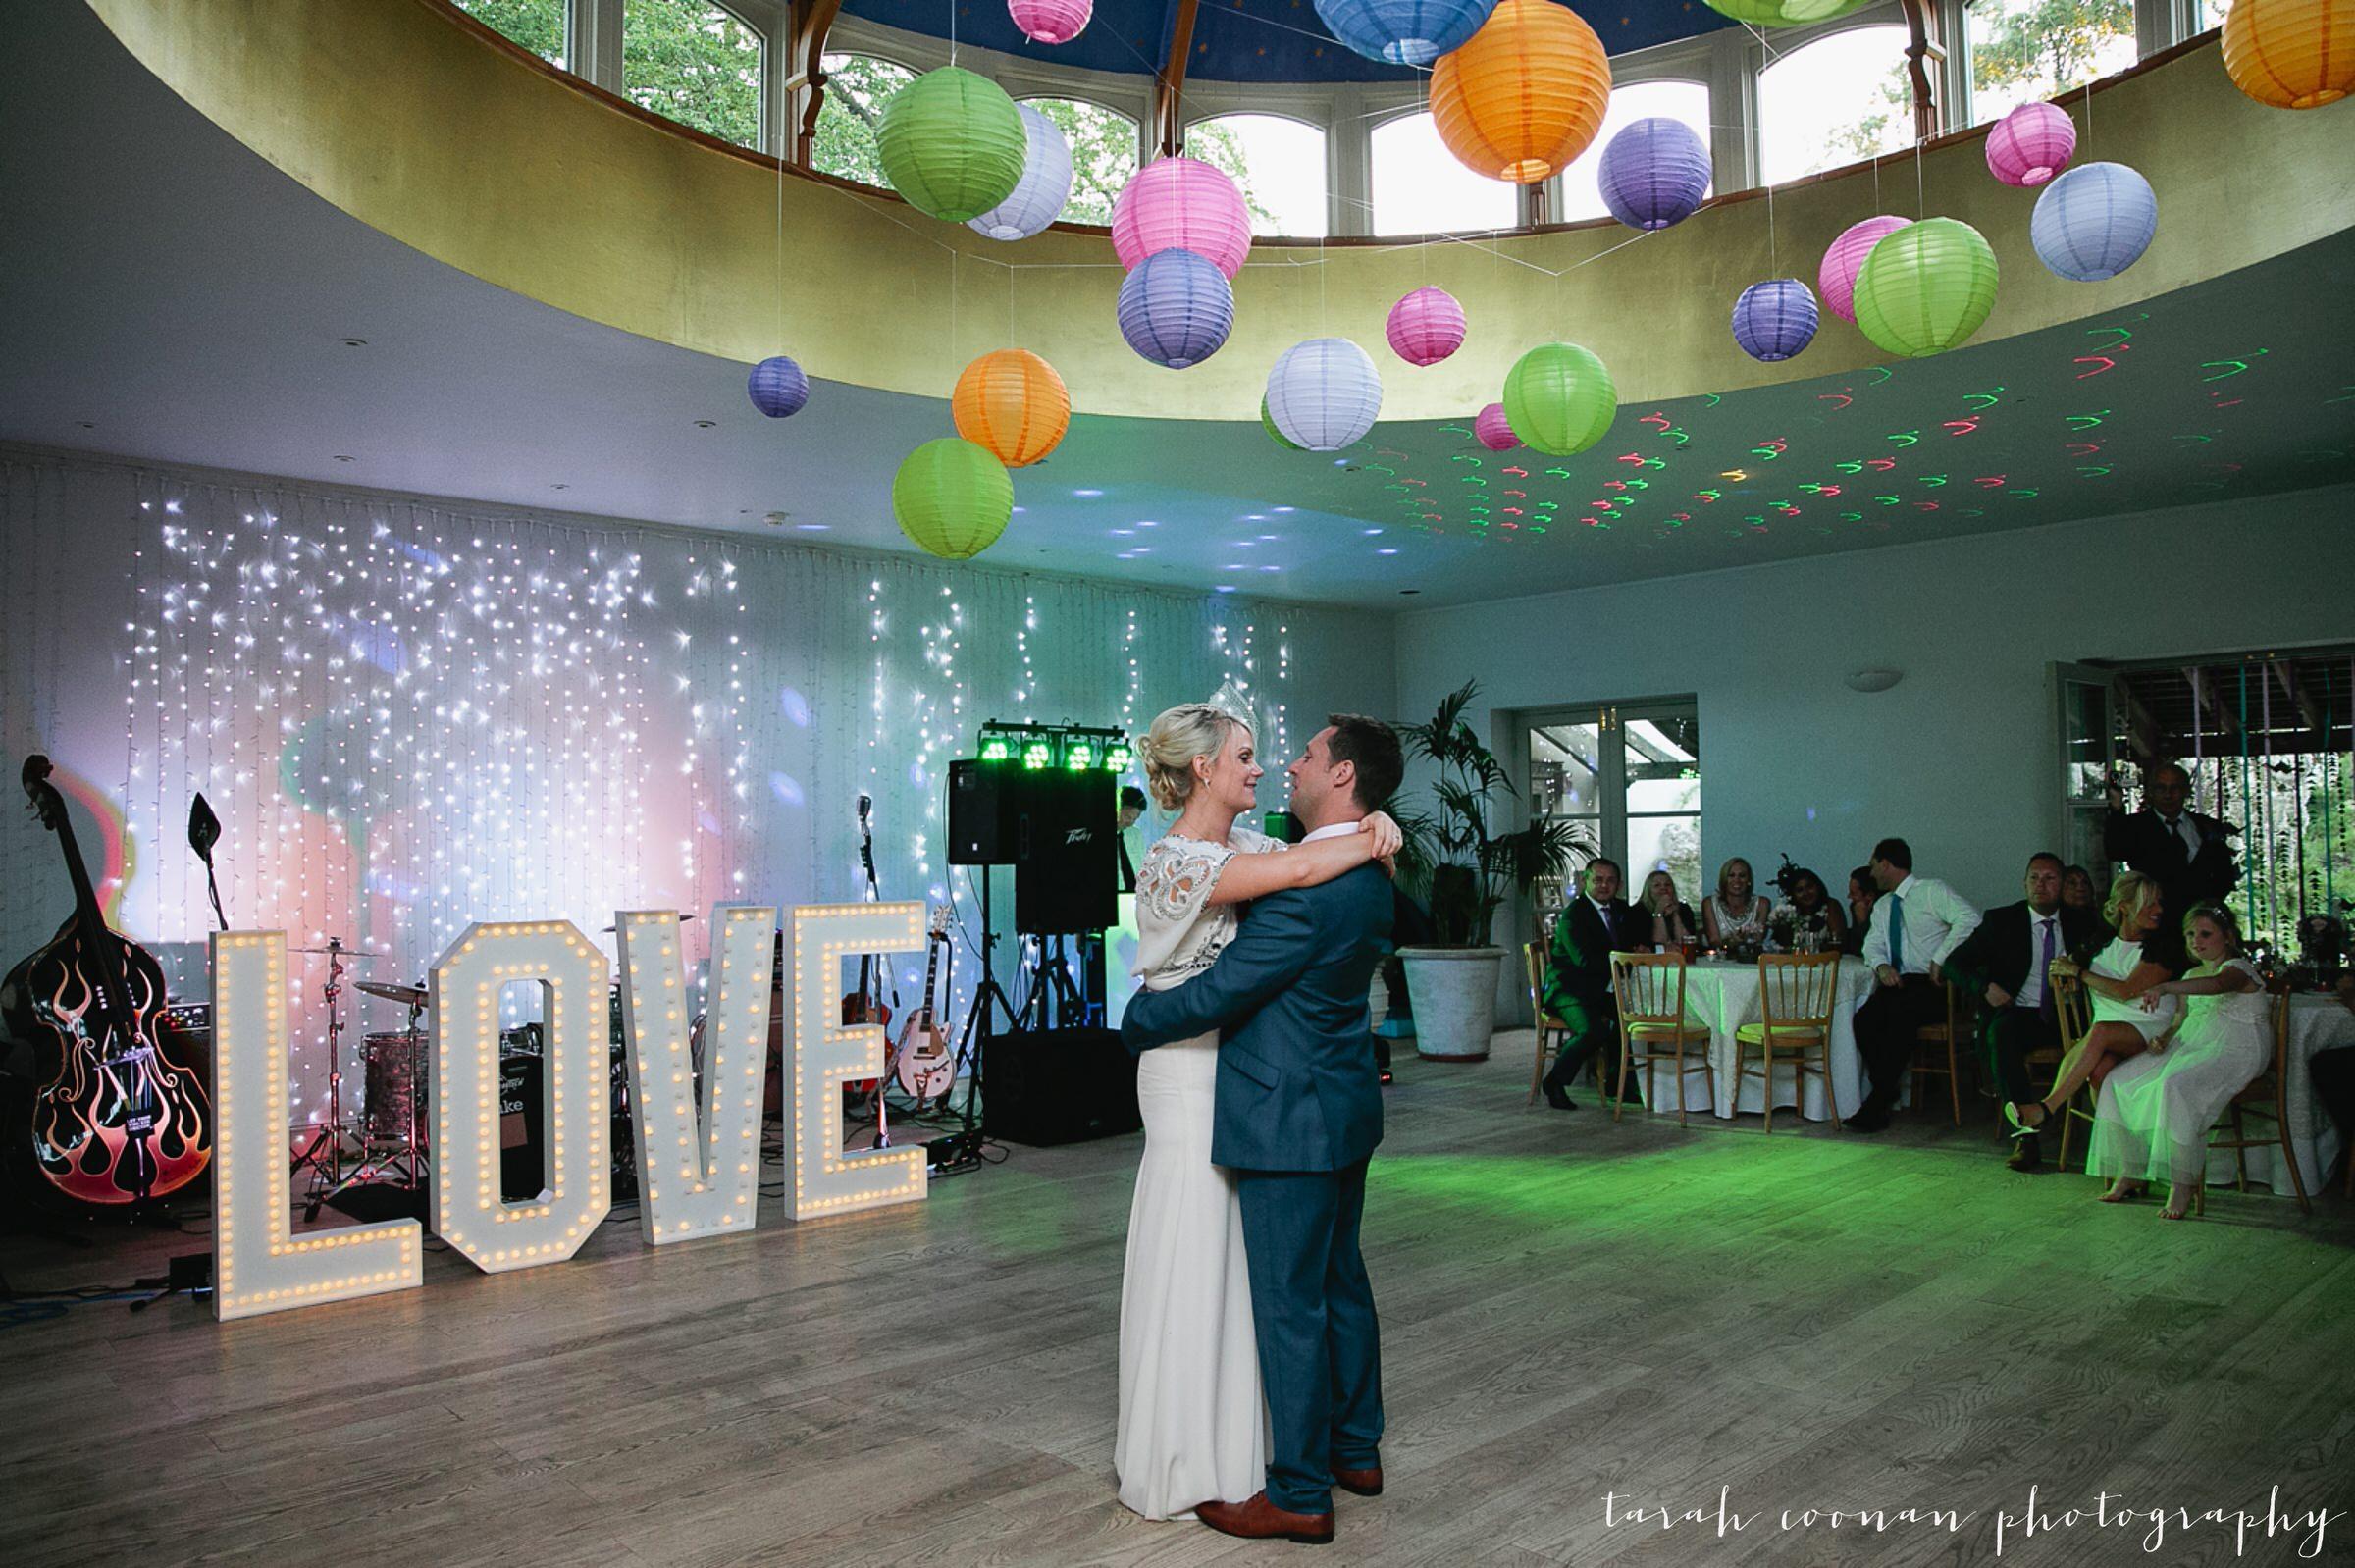 brighton-wedding-photographer96